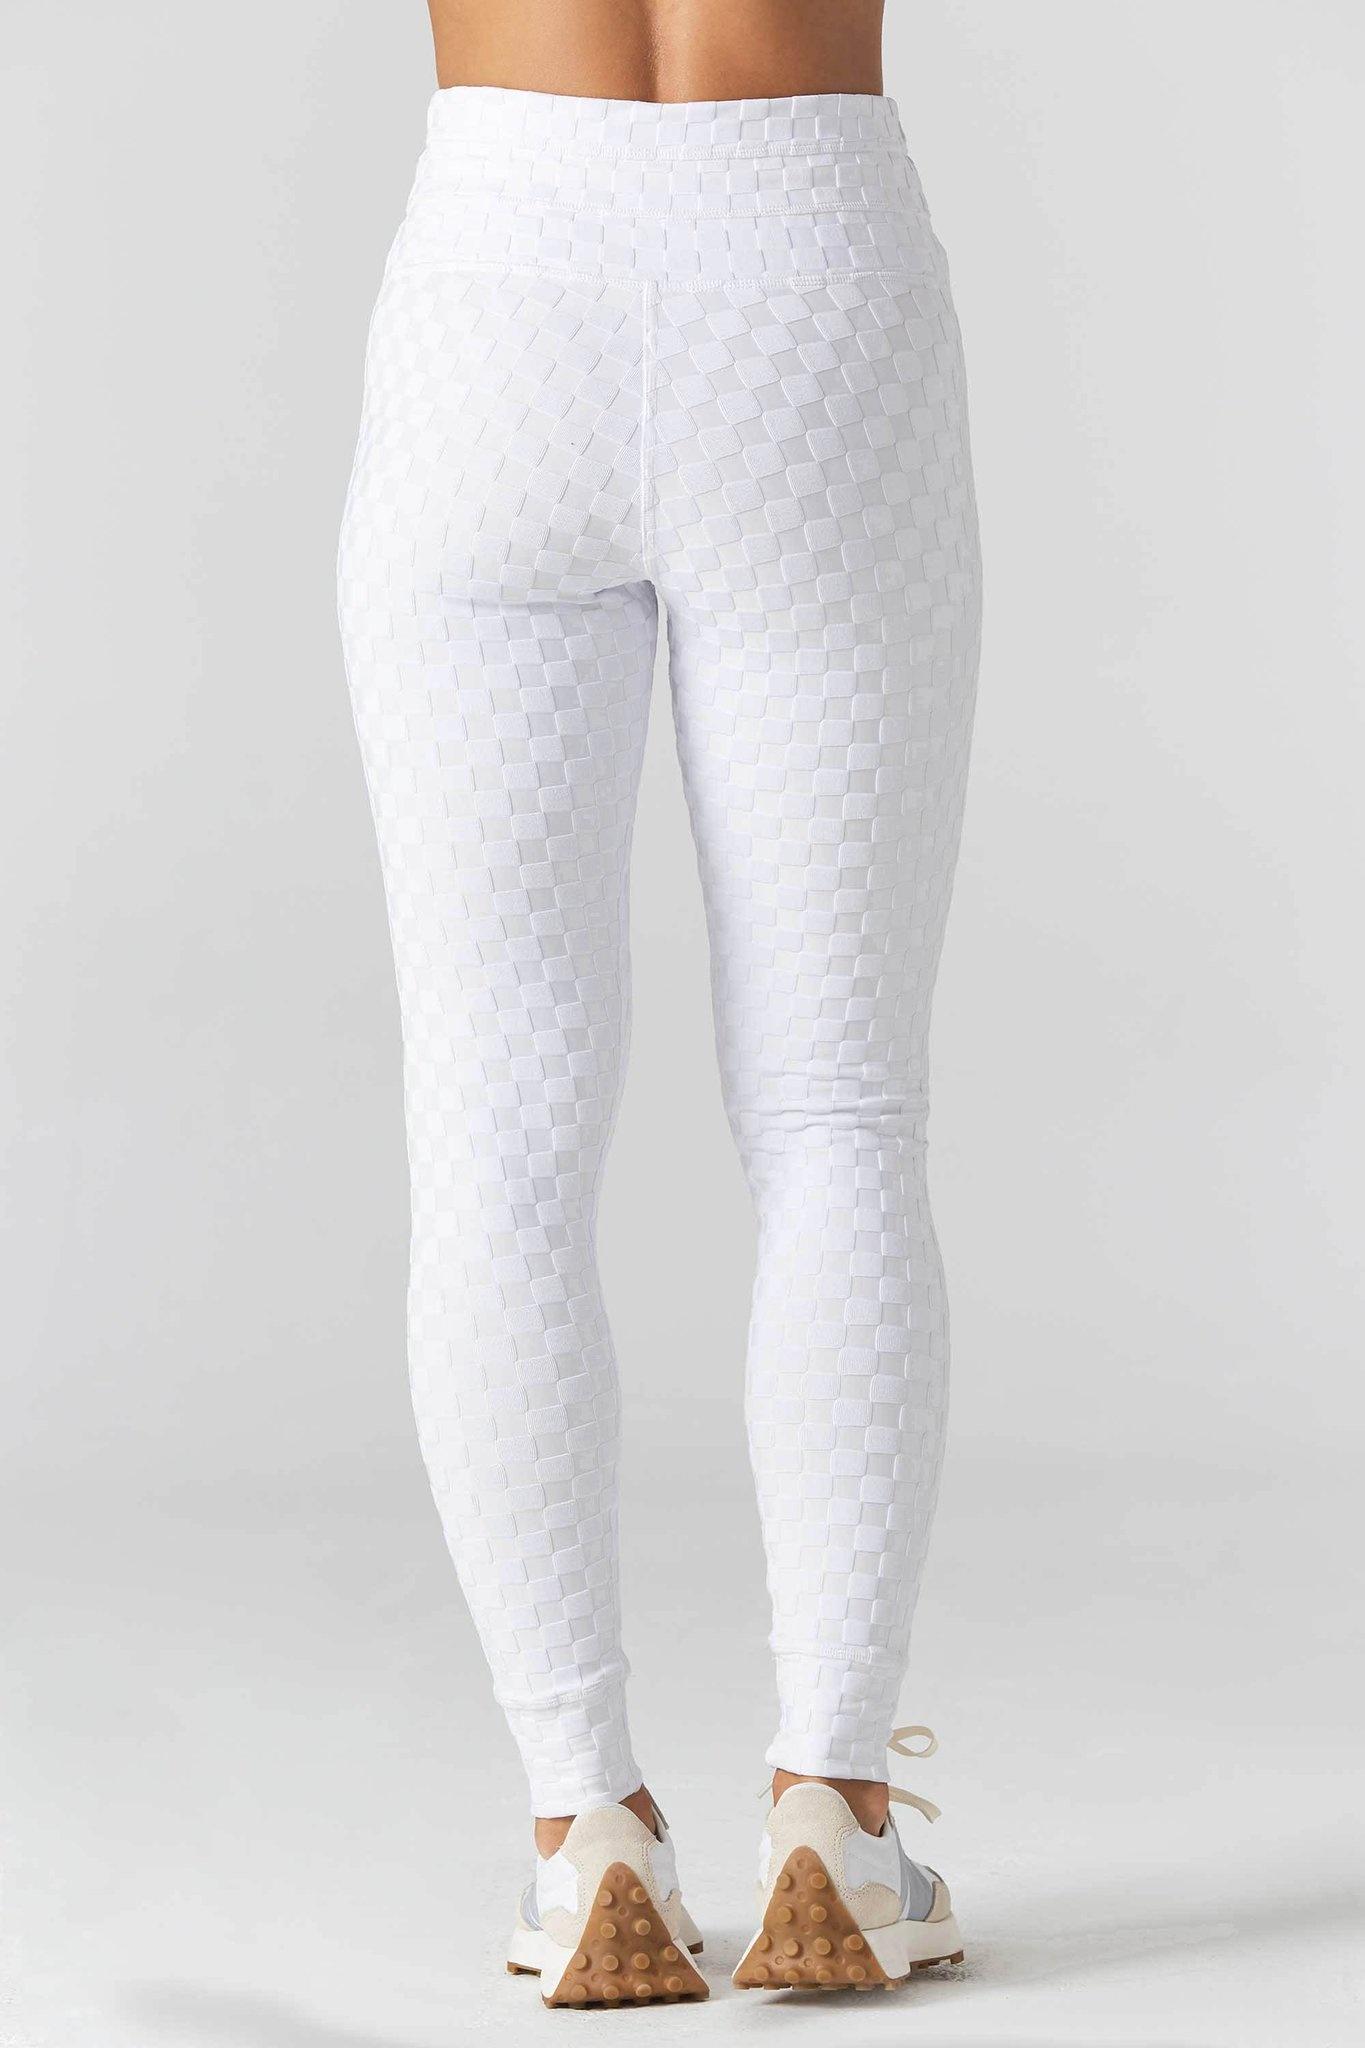 9.2.5 Welcome Ohm Jacquard White Legging